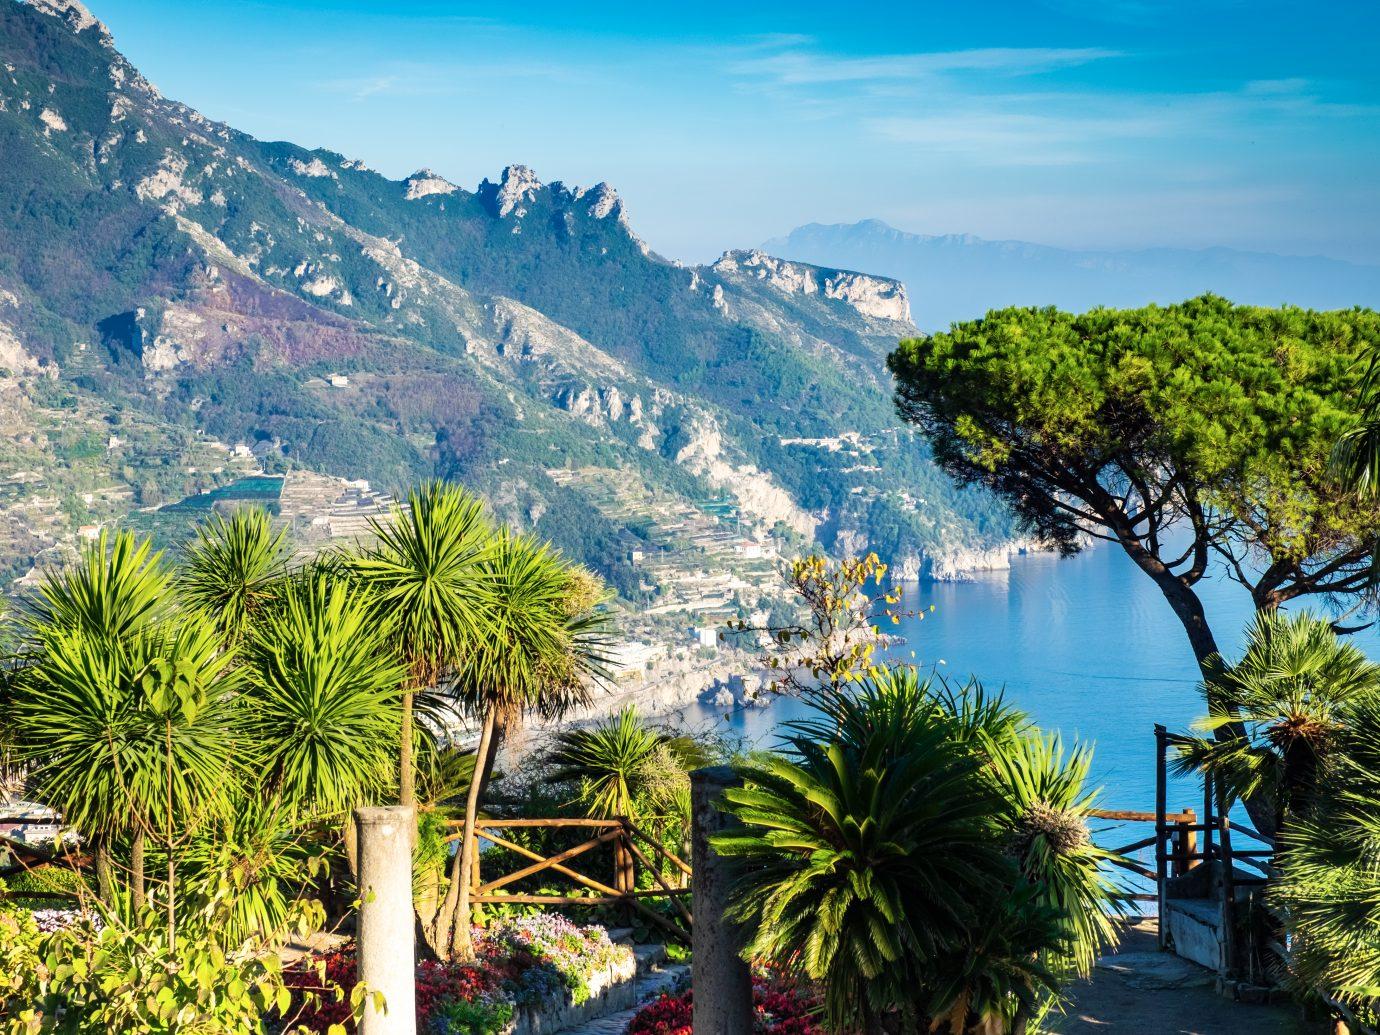 Romantic walkway and ornamental garden with colorful flowers, Villa Rufolo, Ravello, Amalfi coast, Italy, Europe